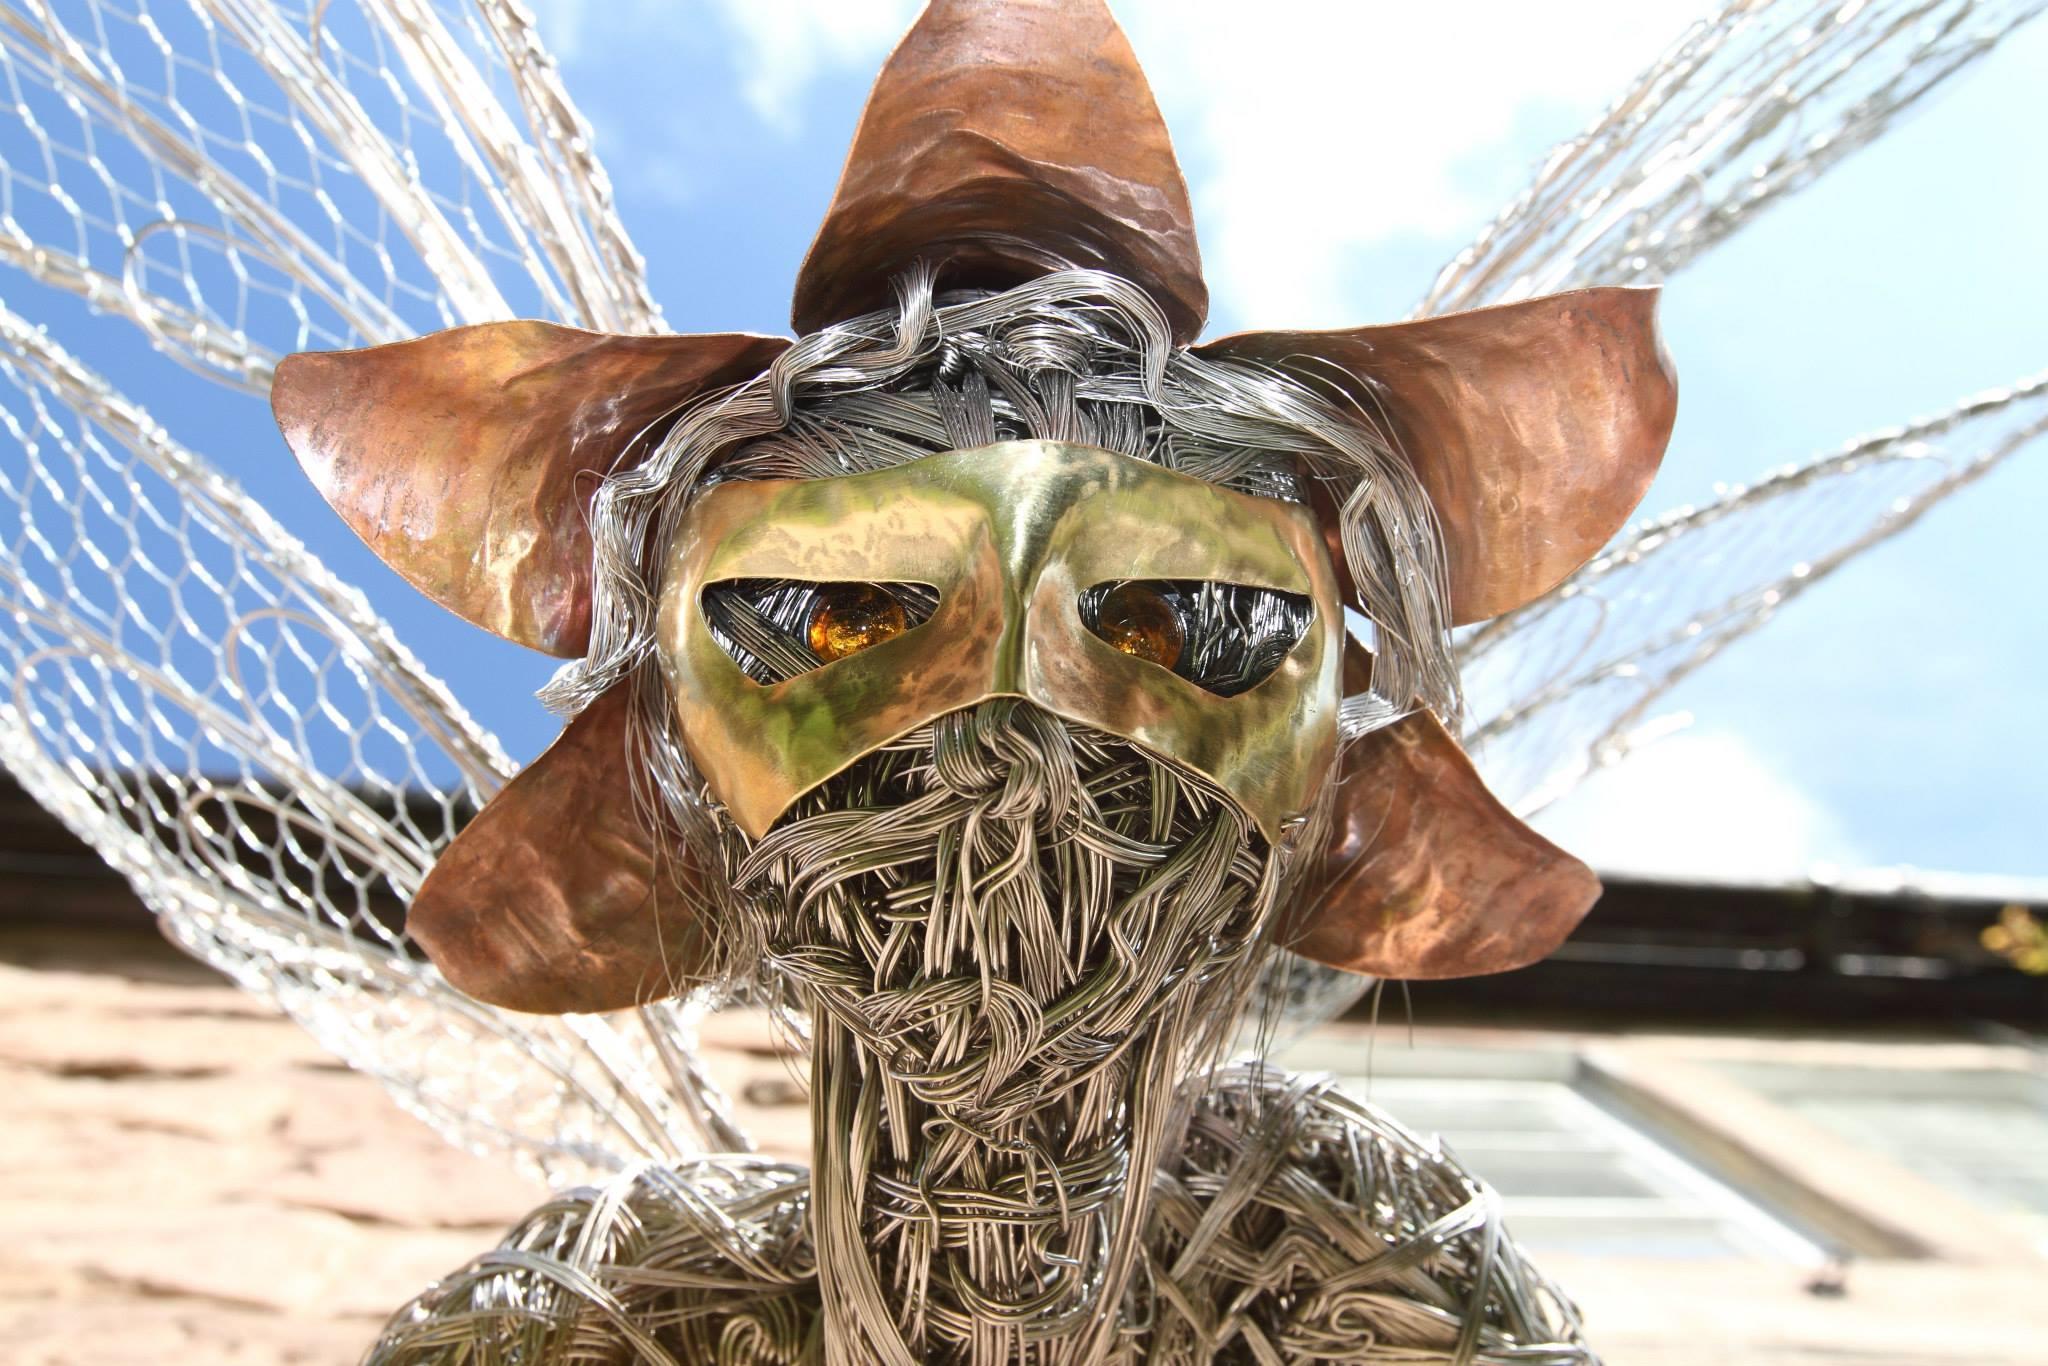 esculturas-fantasticas-de-robin-wight-15